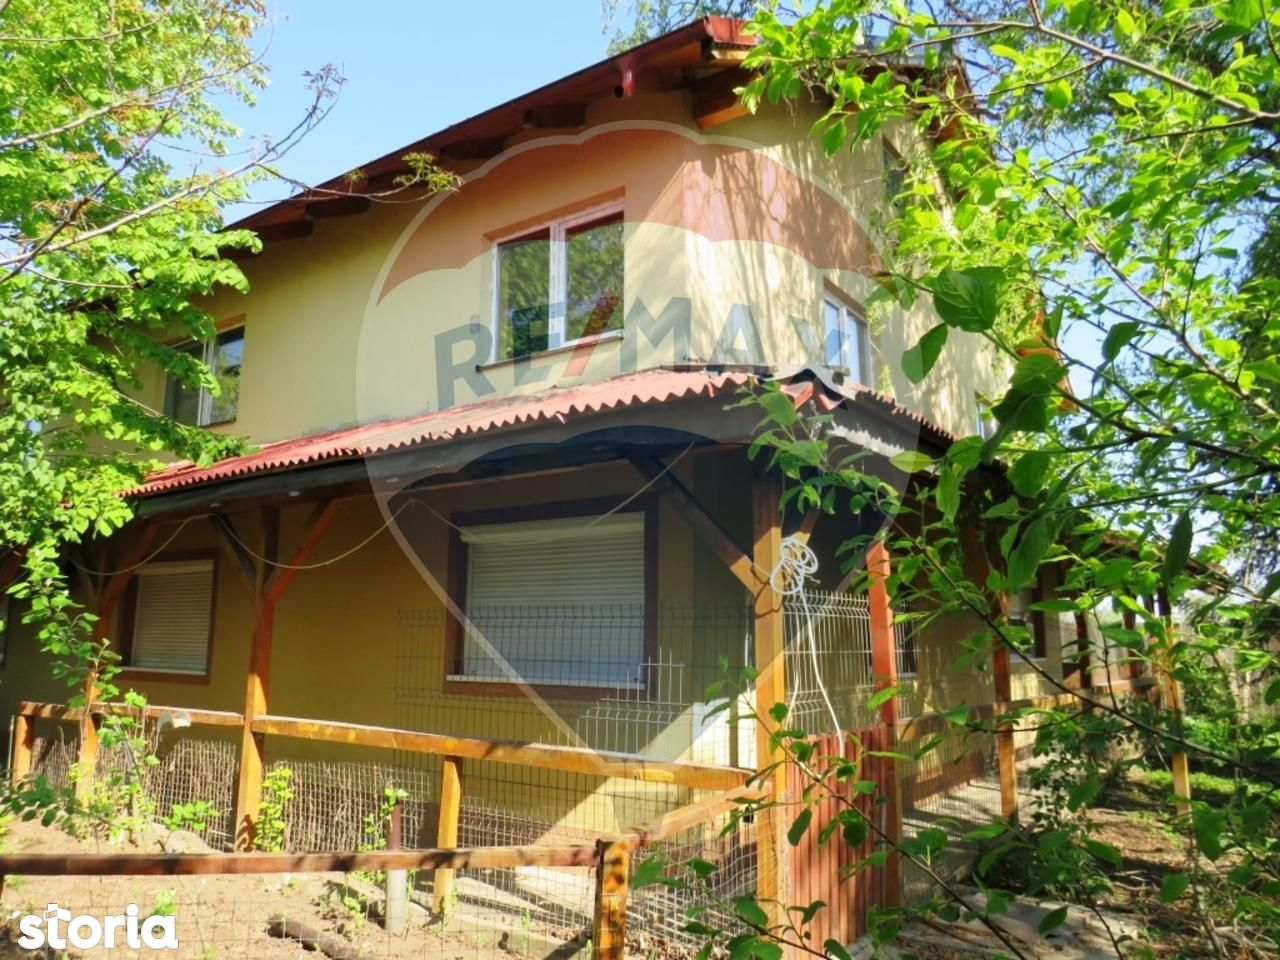 Casa de vanzare, București (judet), Strada Teiuș - Foto 3